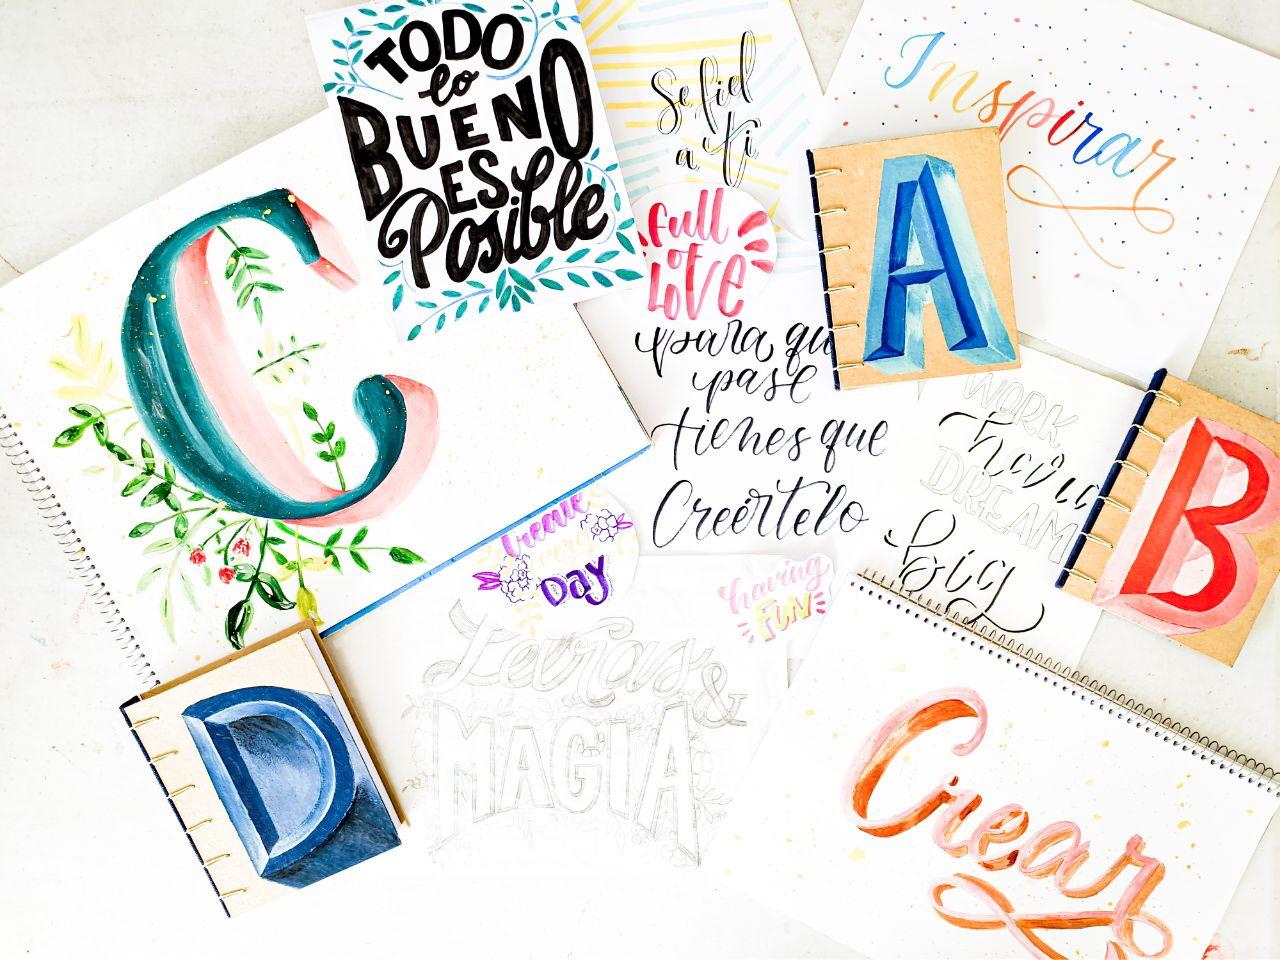 Lettering Art tucci